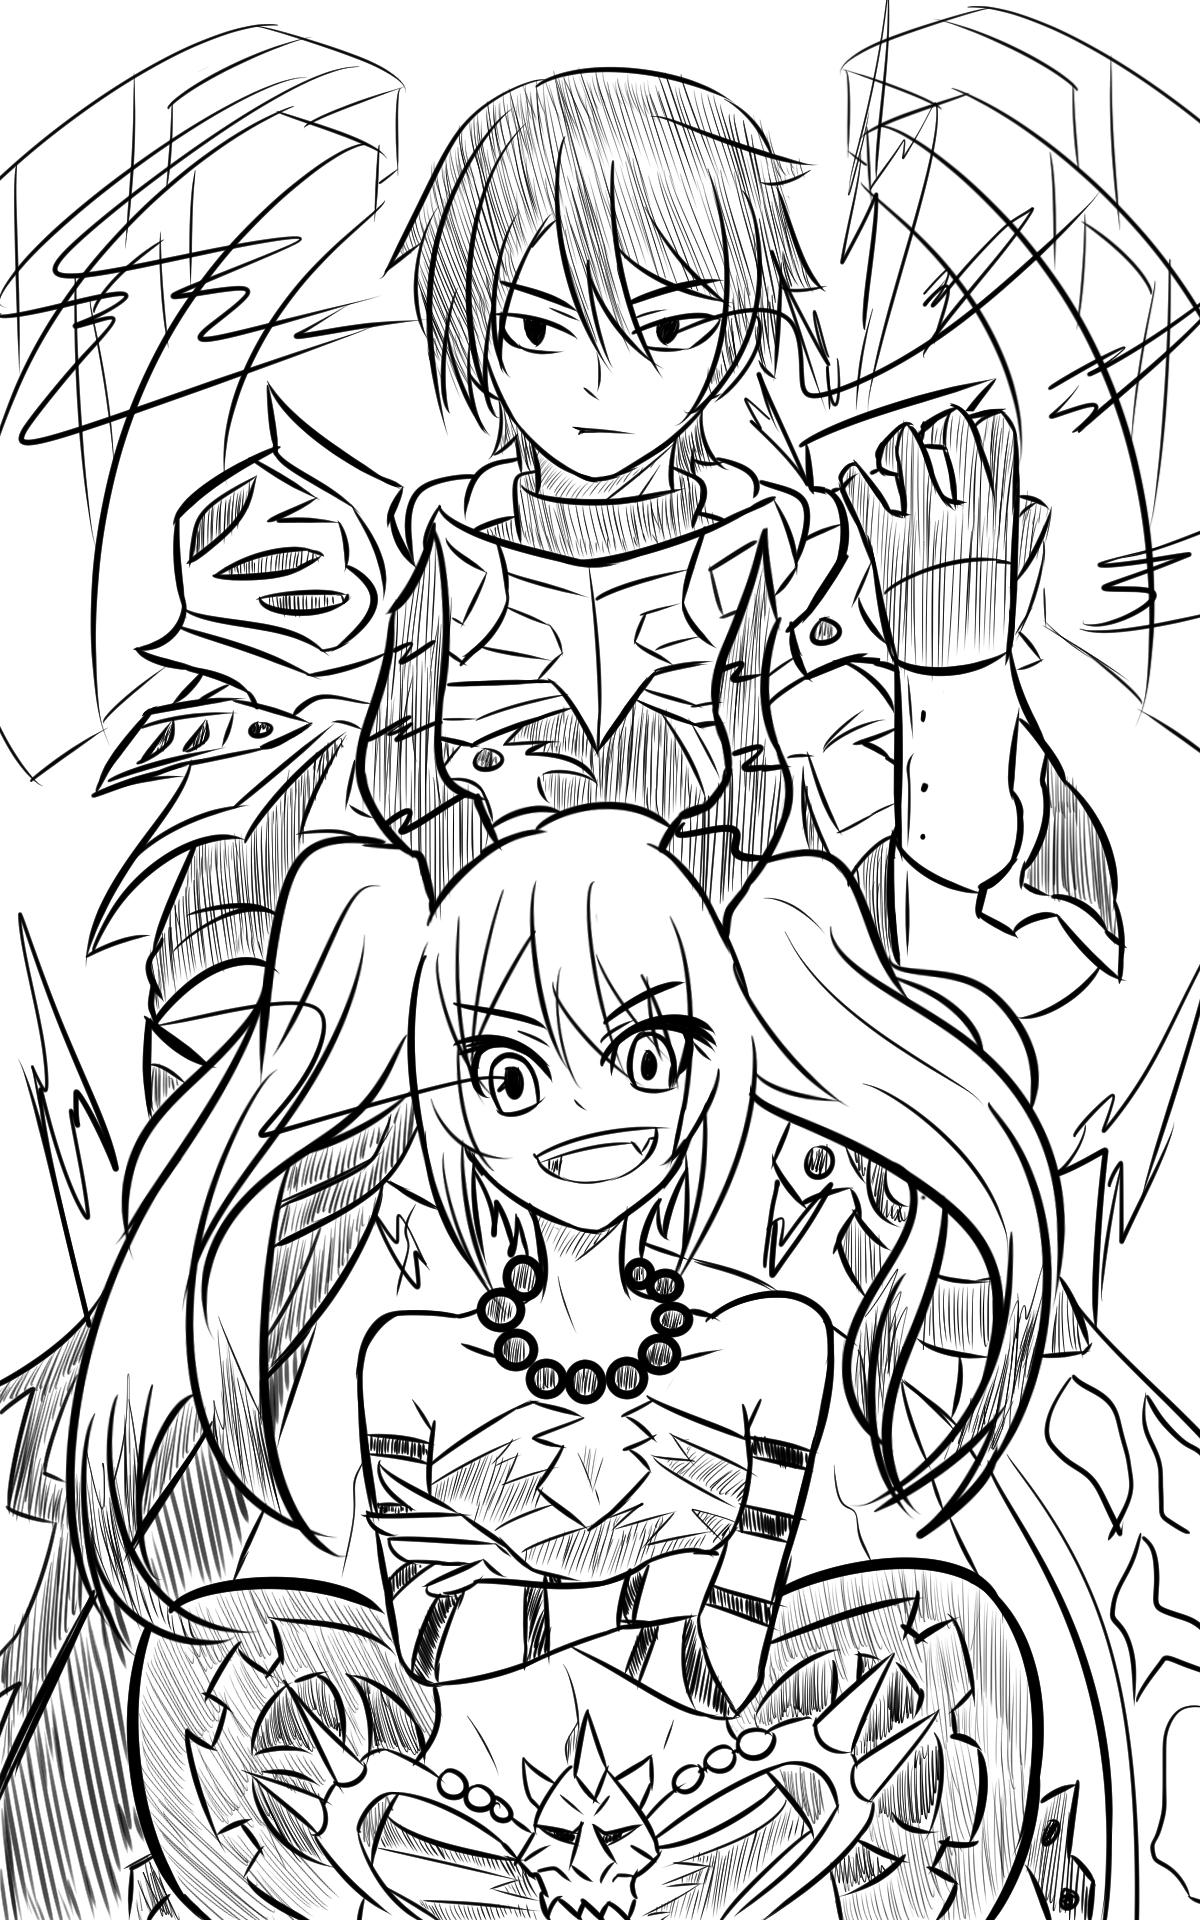 CentralBro/Random Drawings 2